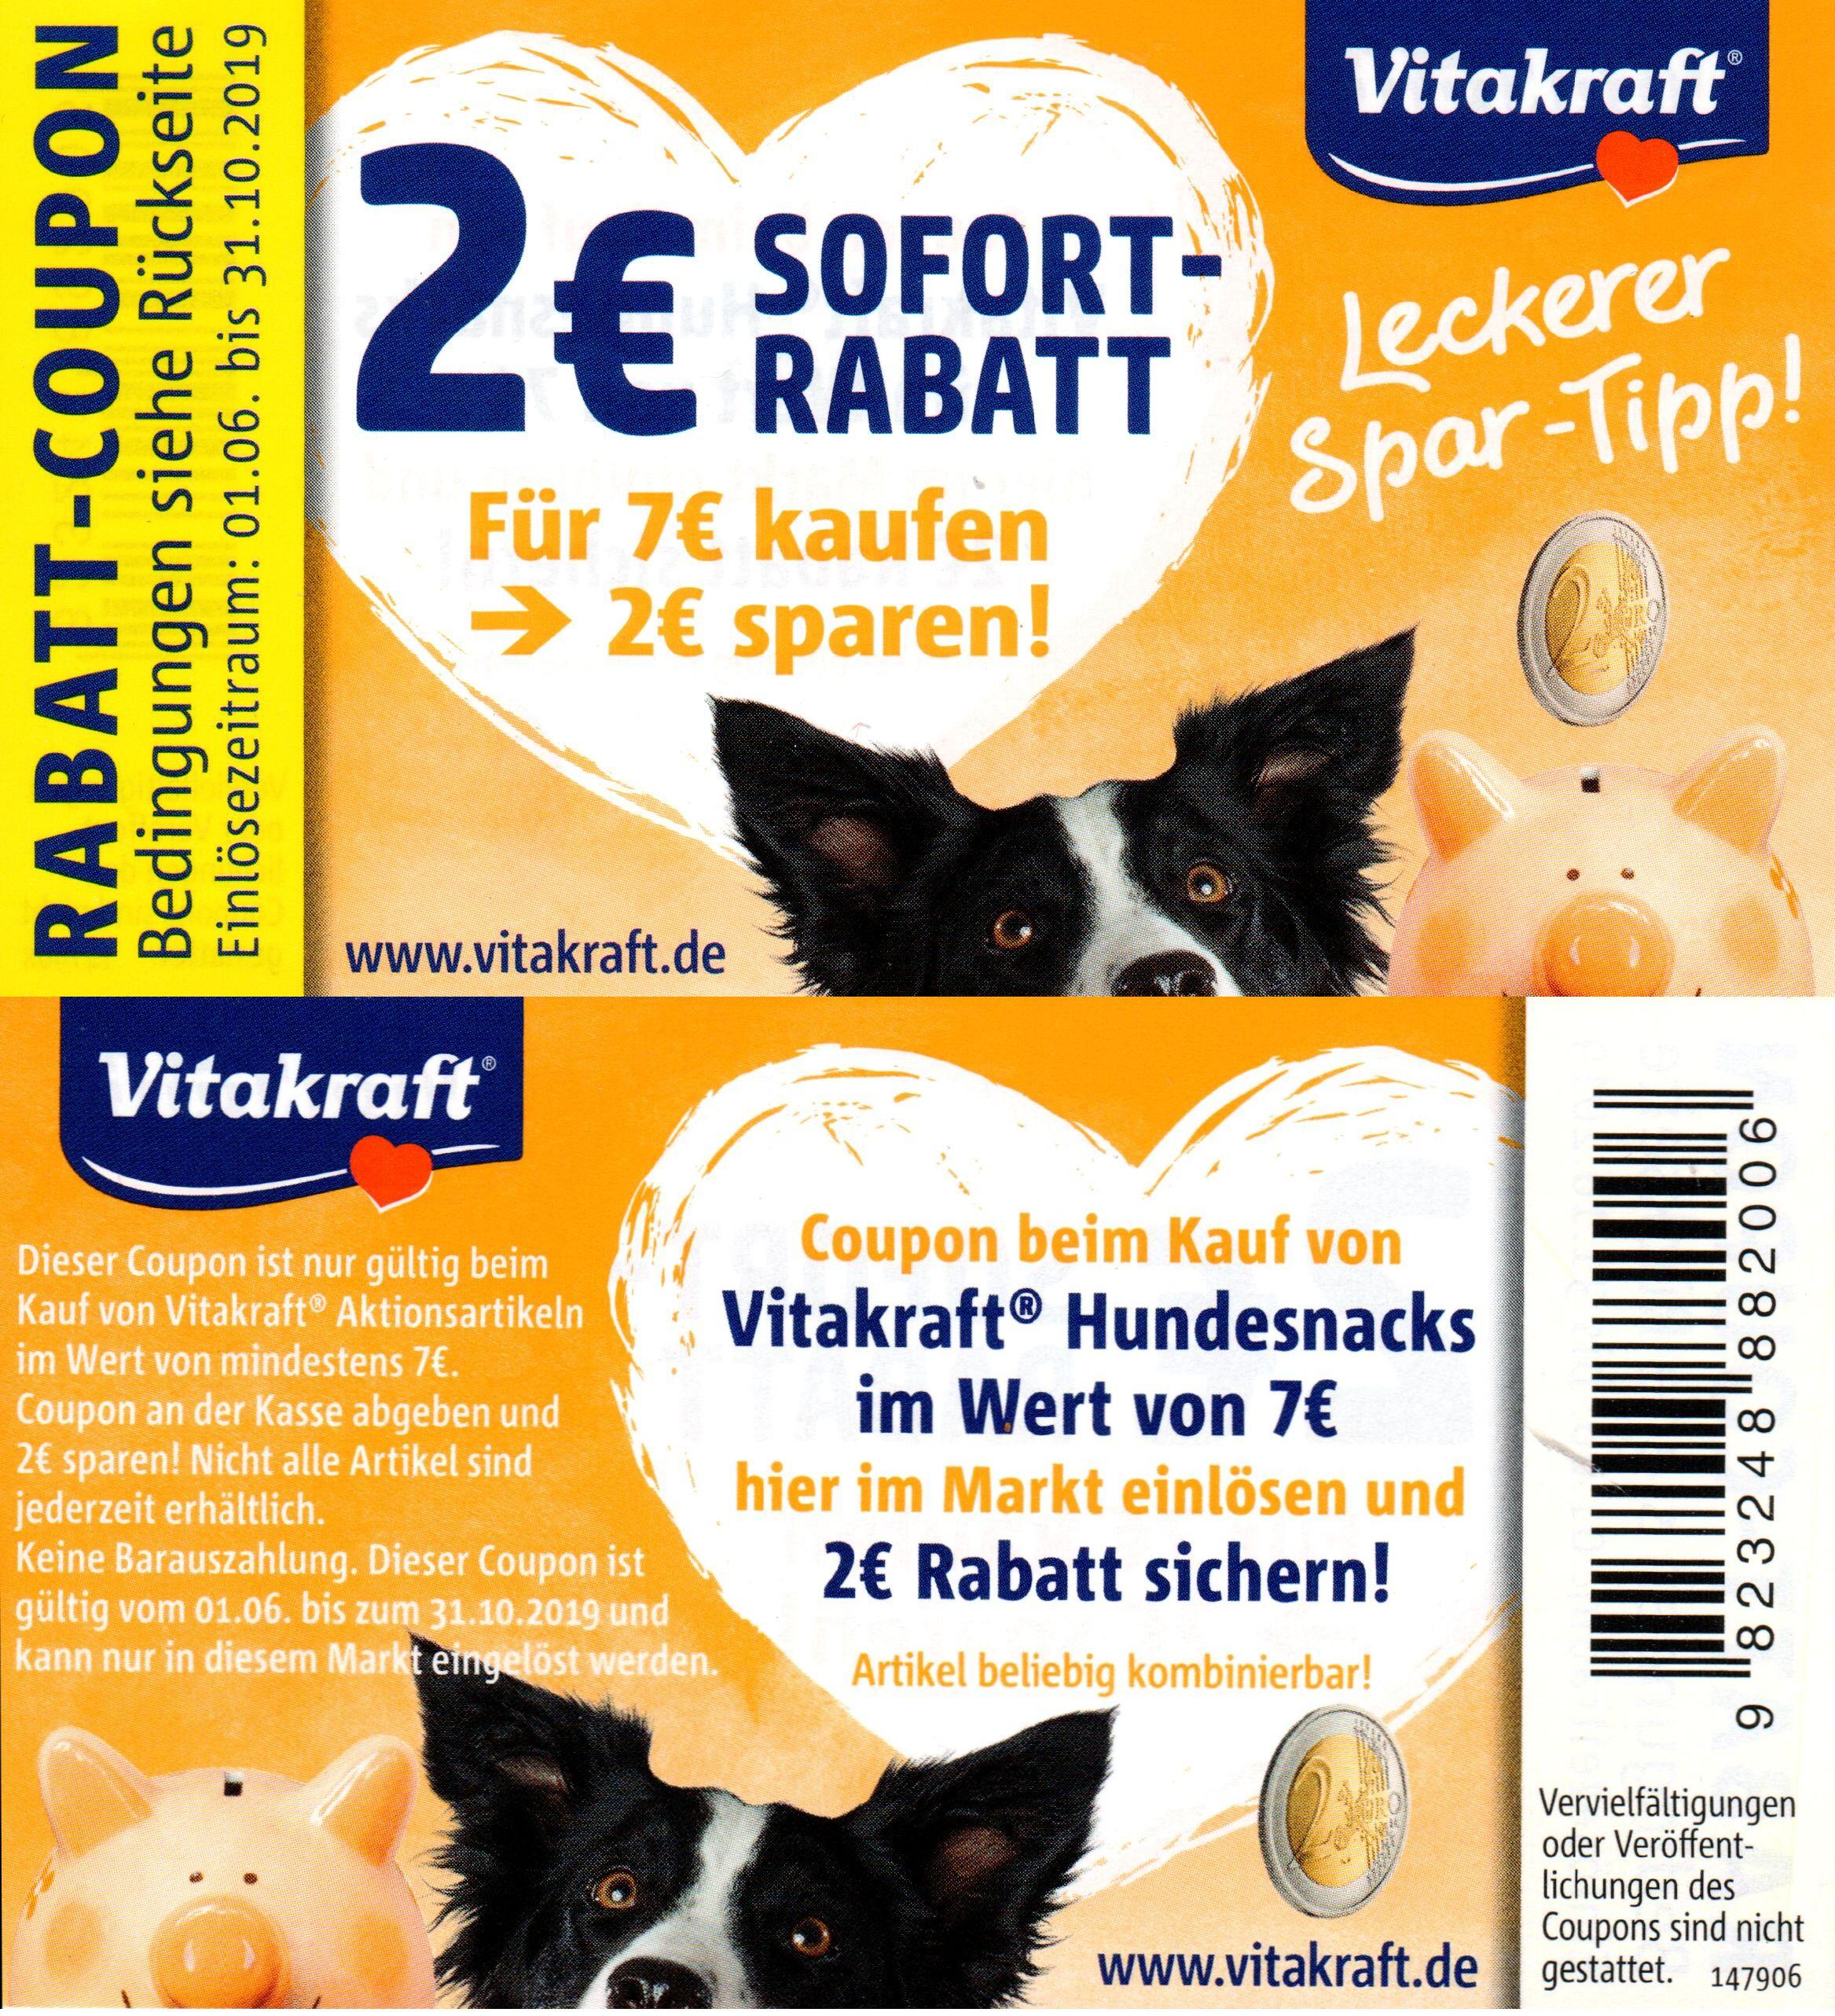 2,00€ Sofort-Rabatt Coupons für Vitakraft Hunde & Katzen Snacks iWv 7,00€ bis 31.10.2019